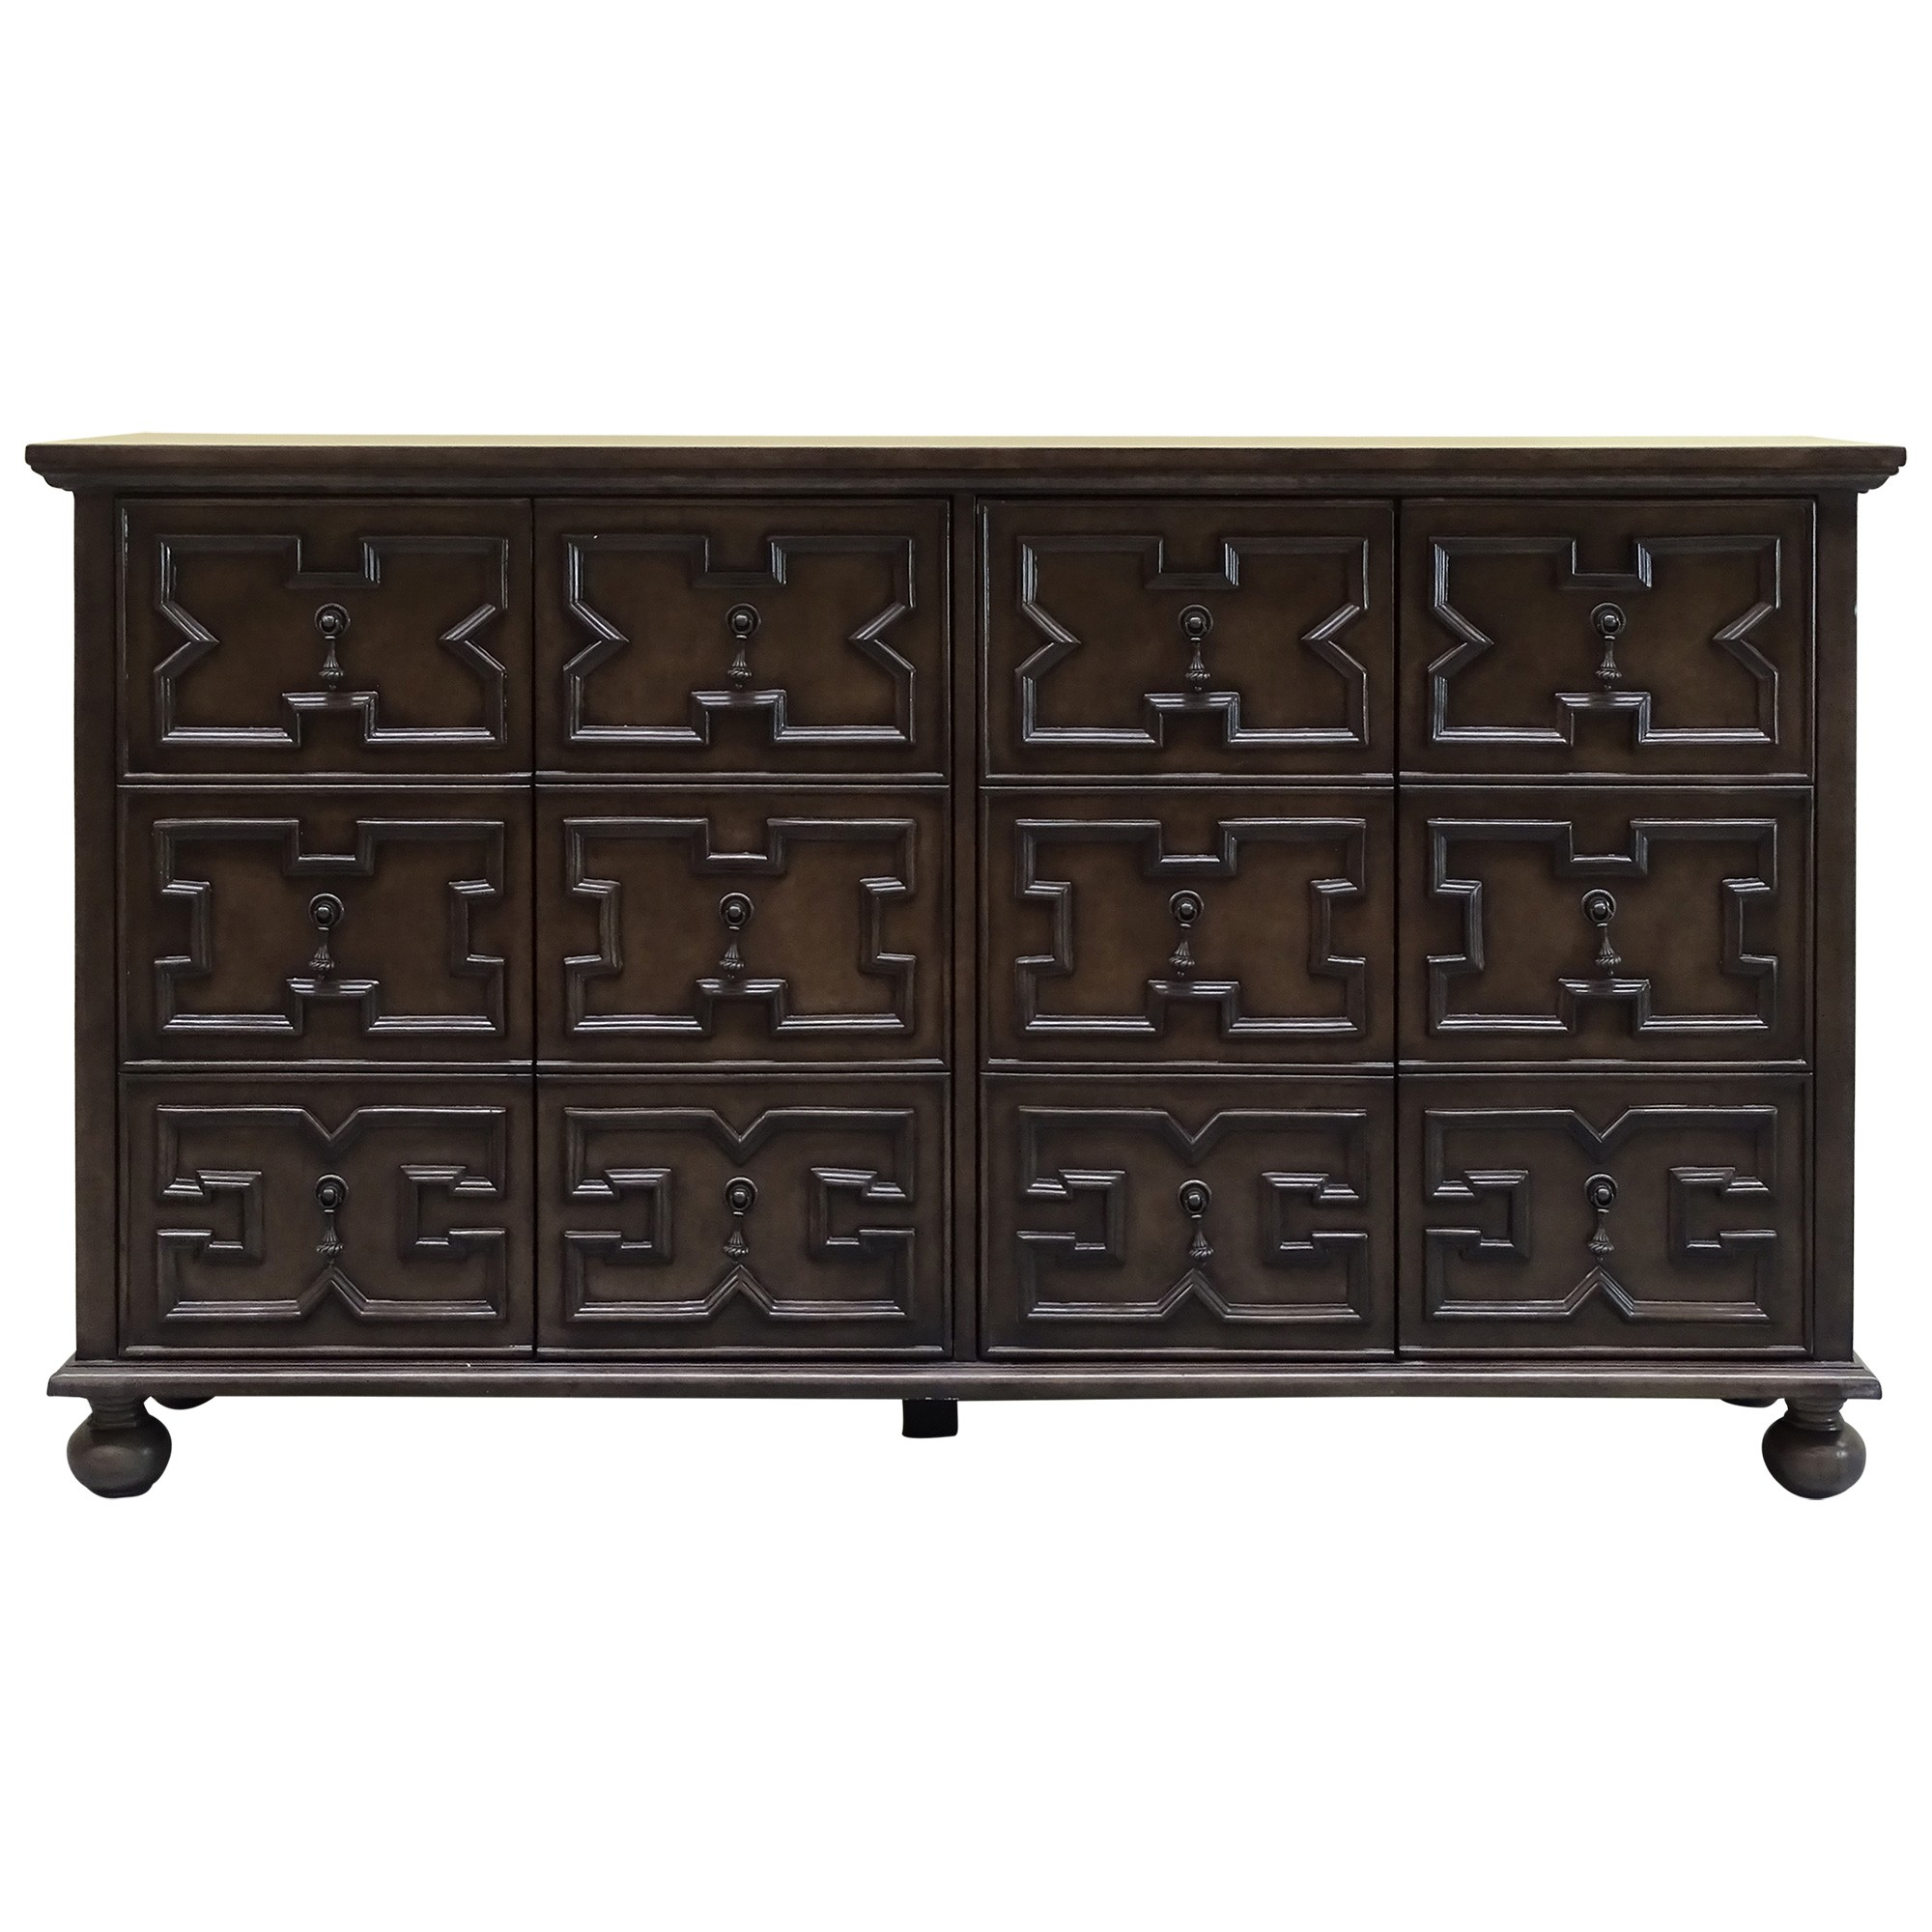 Oscar 4 Door Buffet Table, 158cm